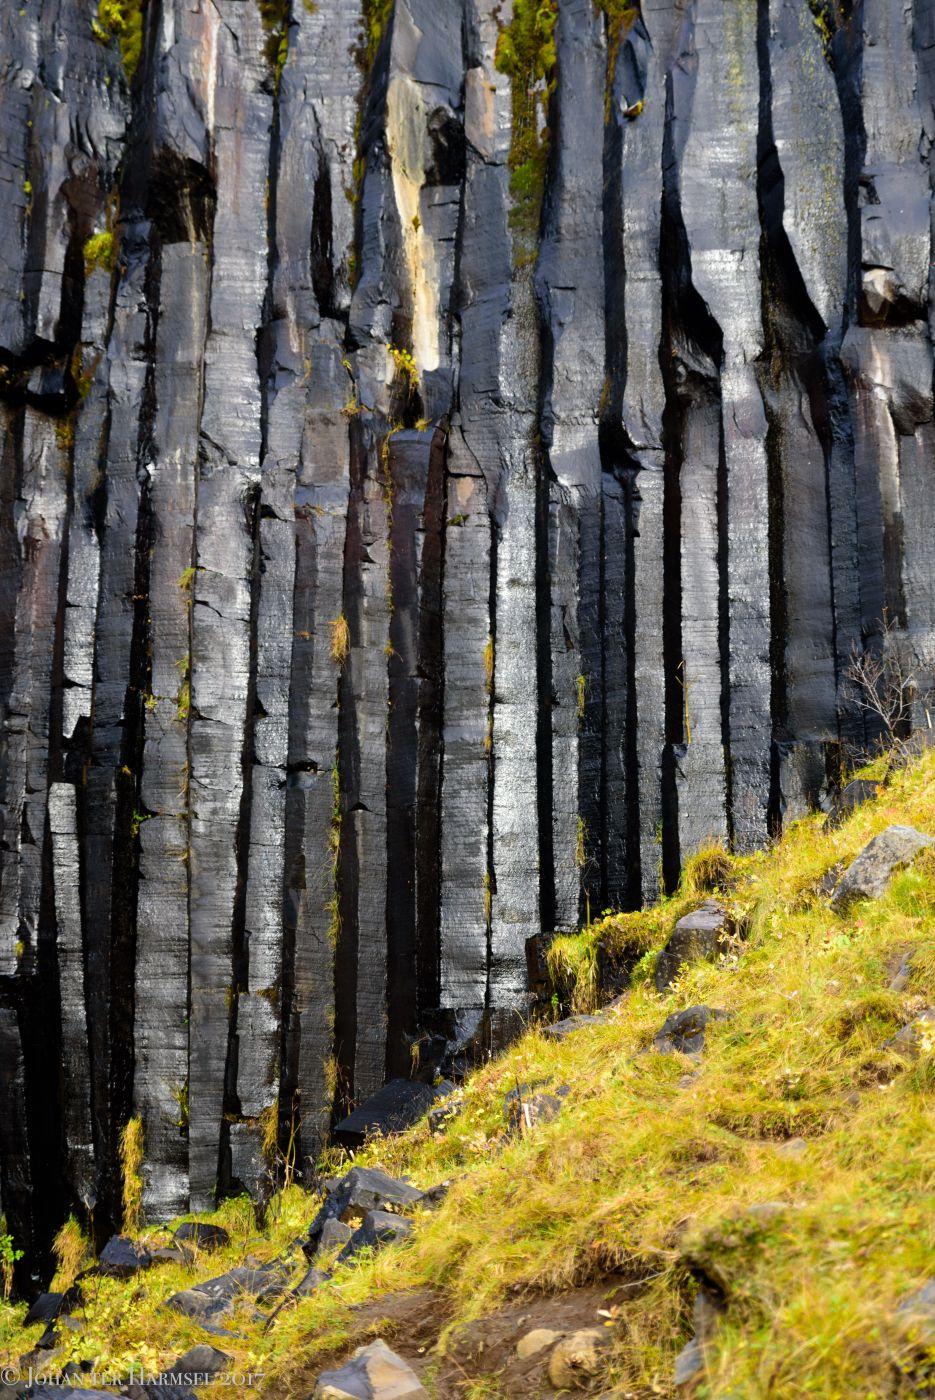 Lava rock pillars at Svartifoss, Iceland